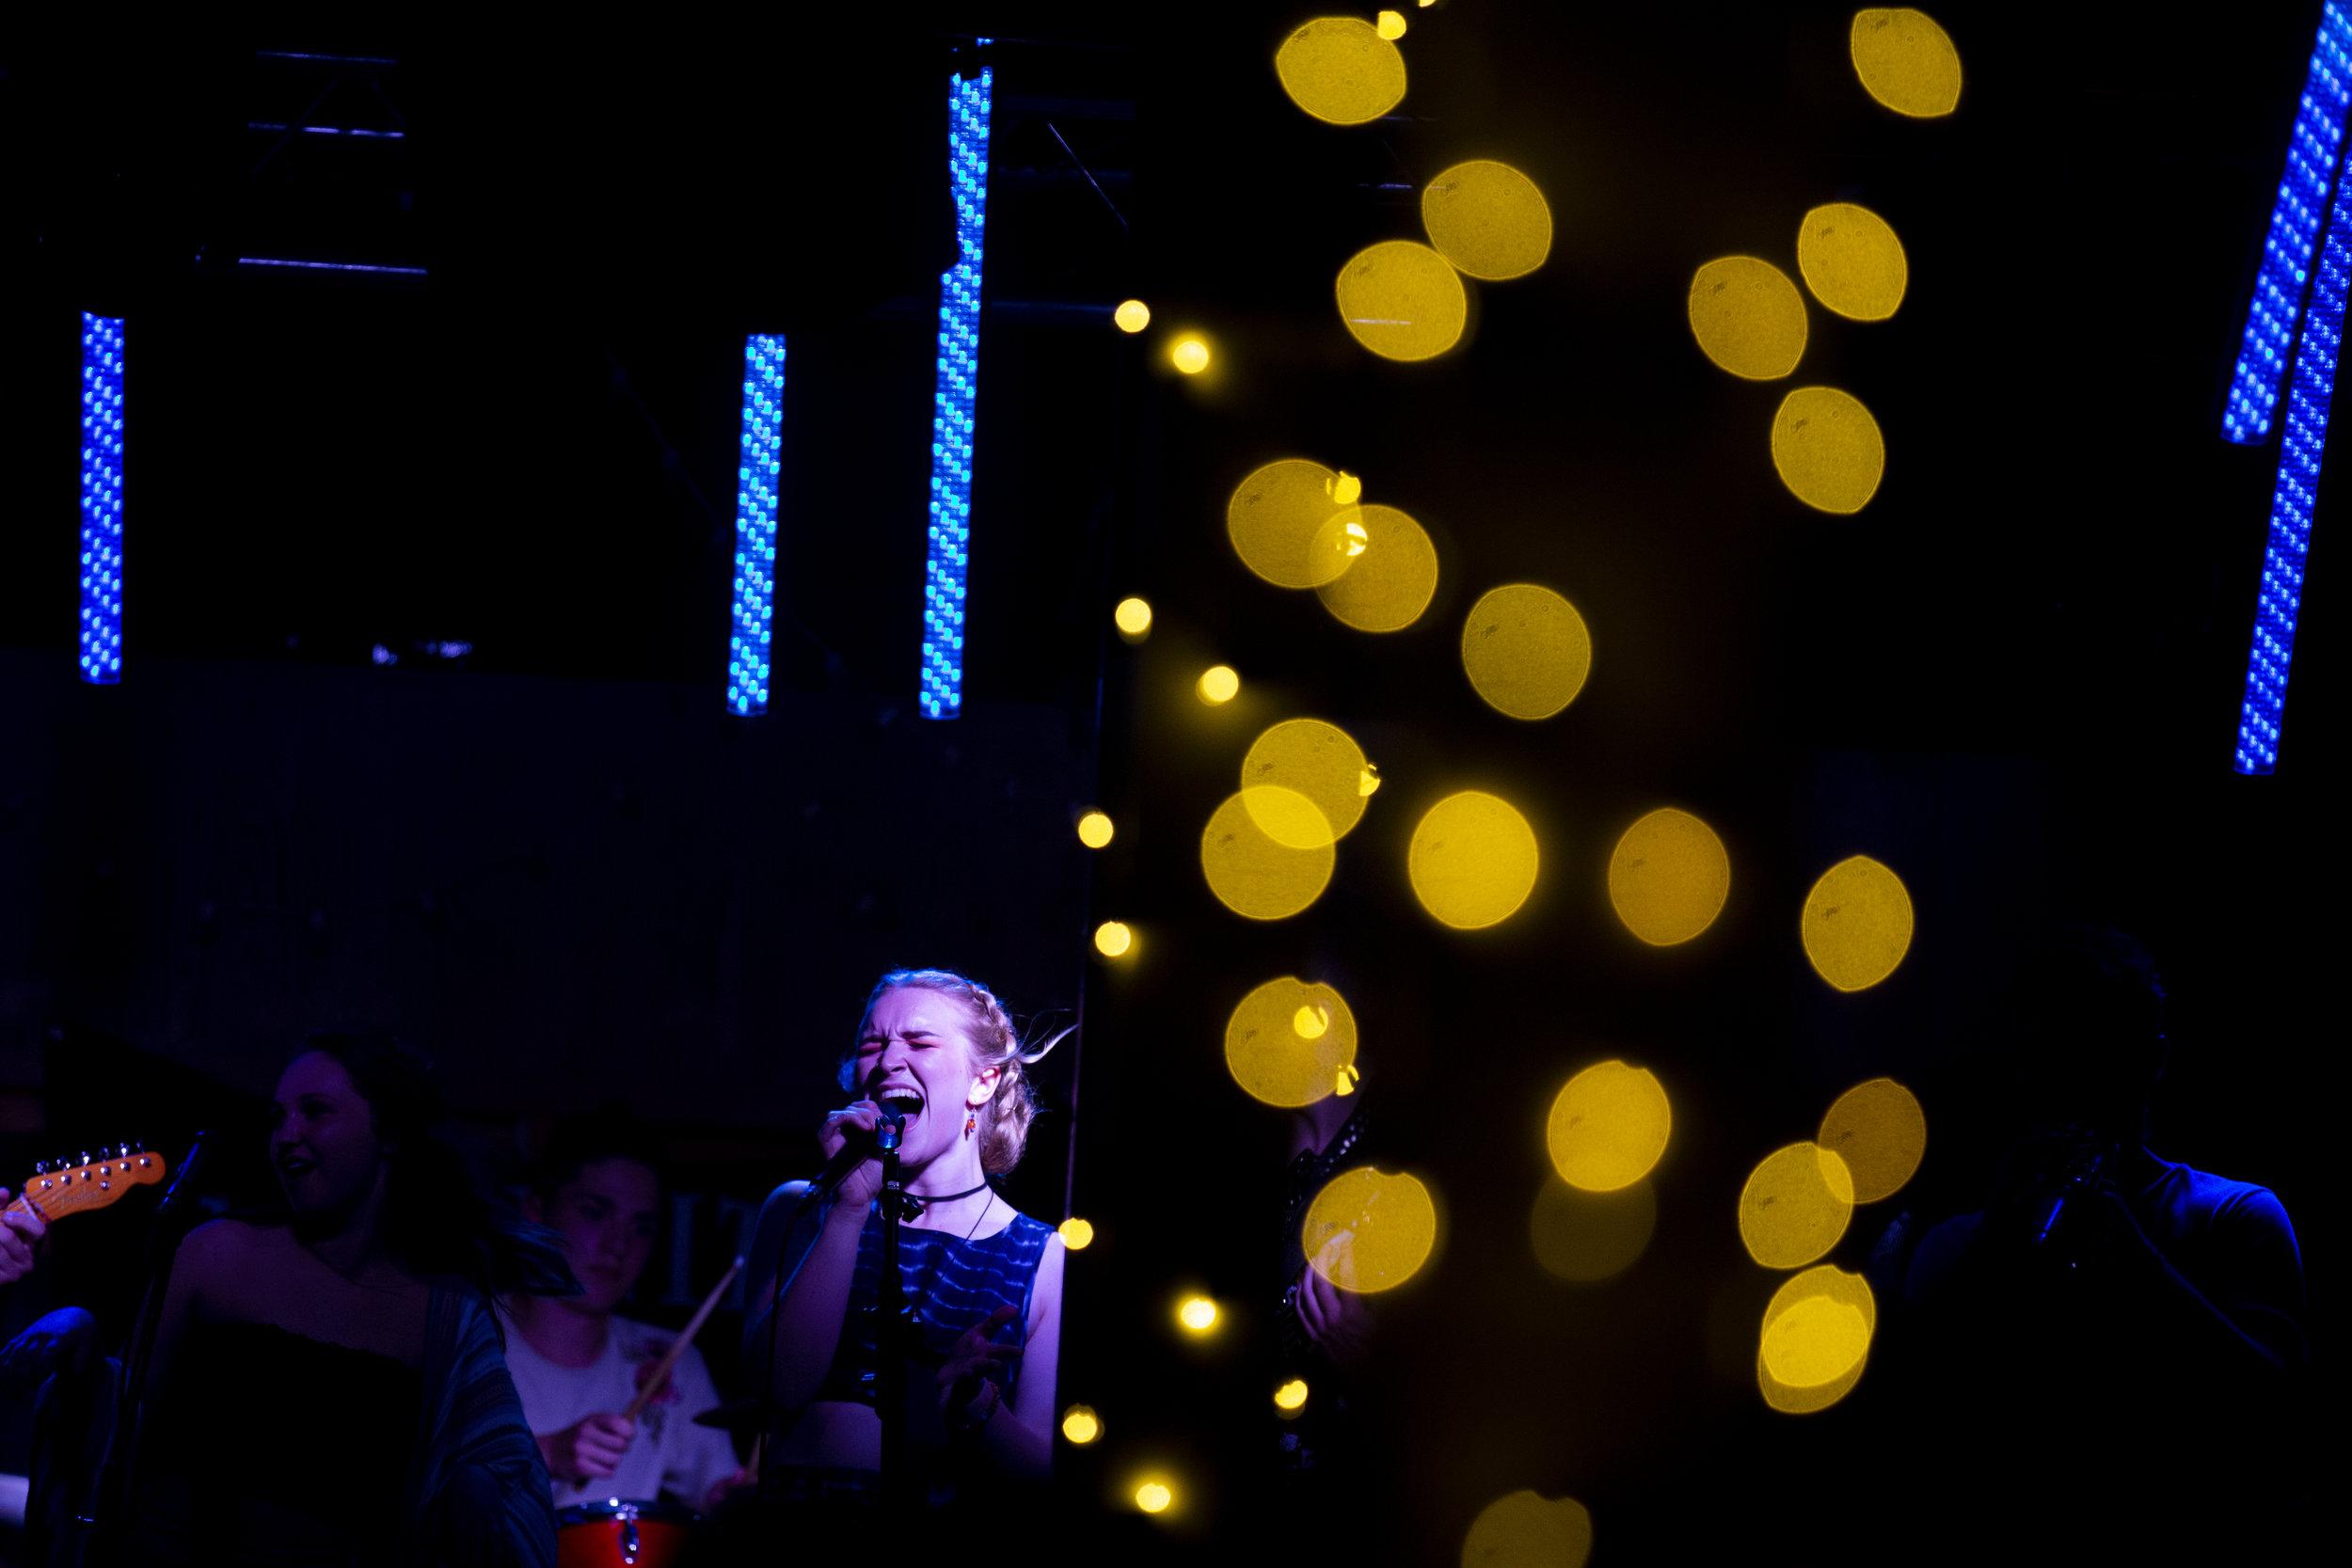 Far & Wide performing at Hullabaloo Music Fesitival. Omaha, NE.